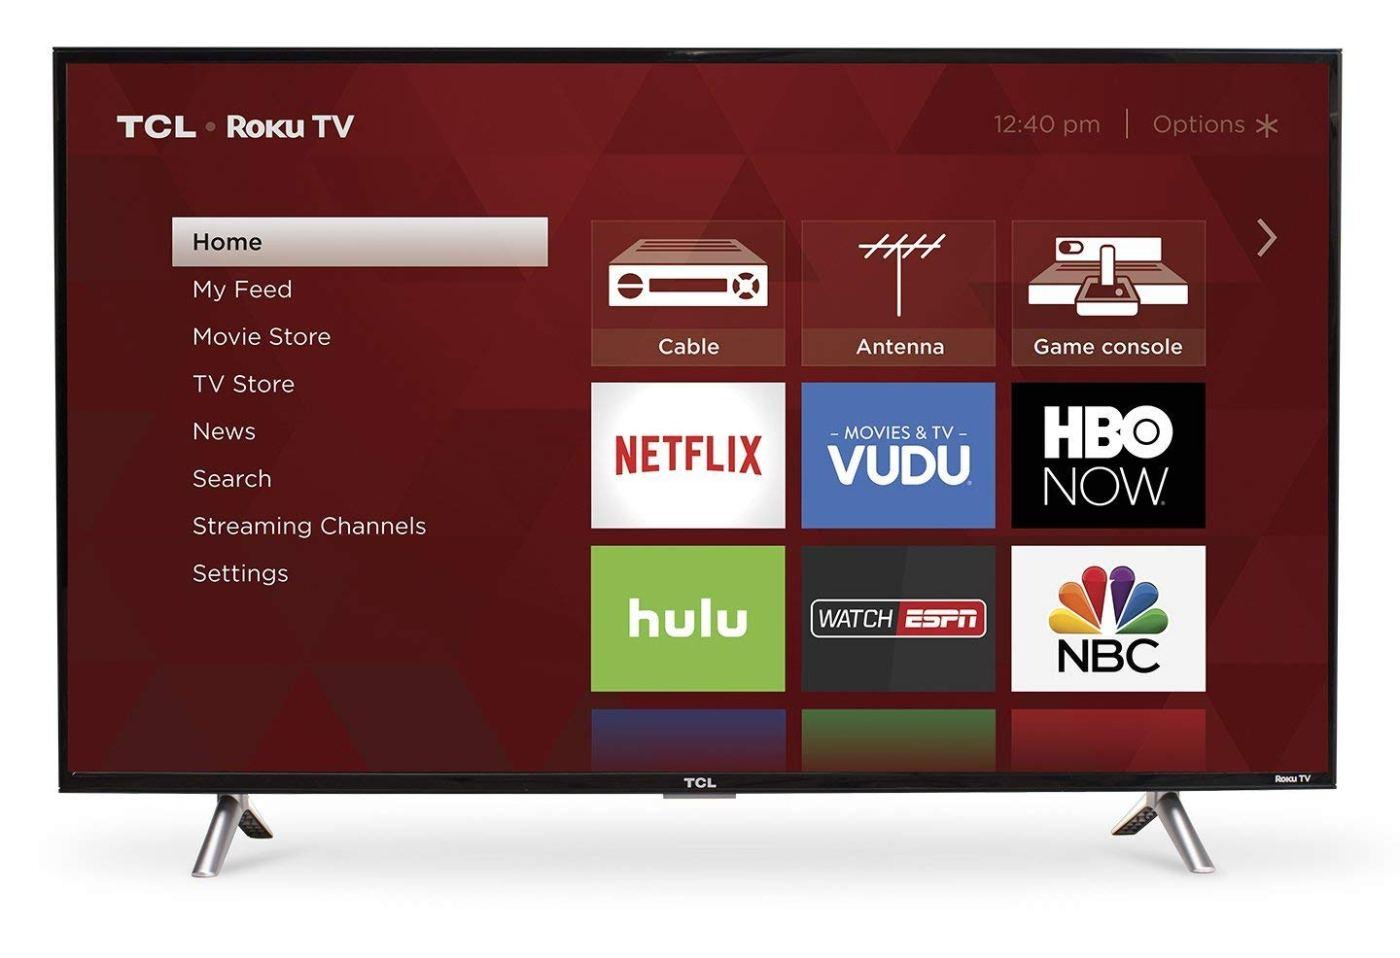 TCL S305 1080p Roku Smart LED TV